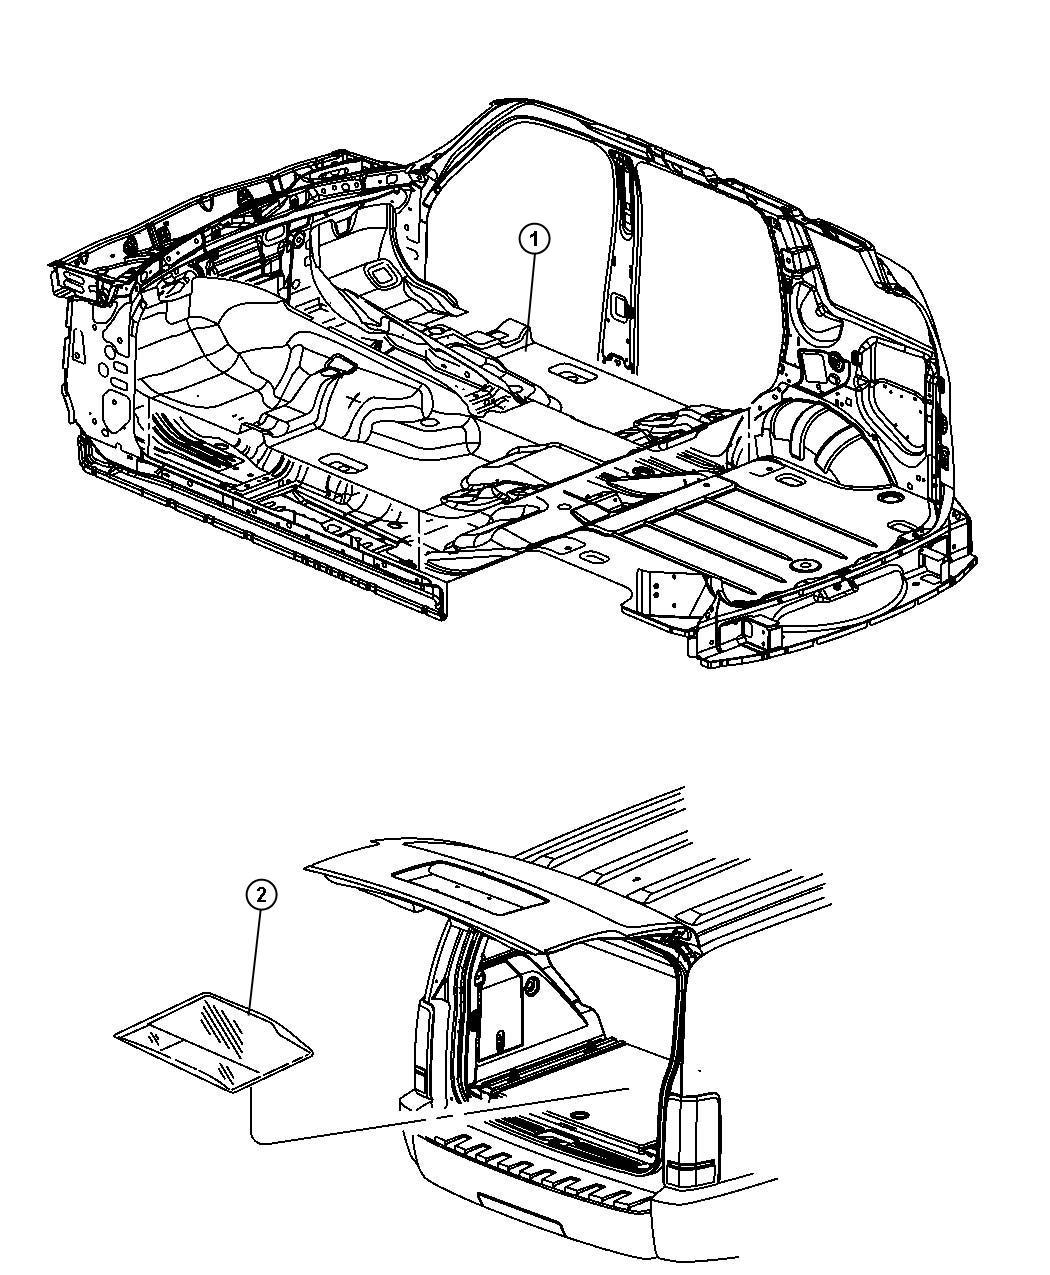 Dodge Nitro Mat kit. Floor. [db] or [dv], [dv]. Trim: (*o0